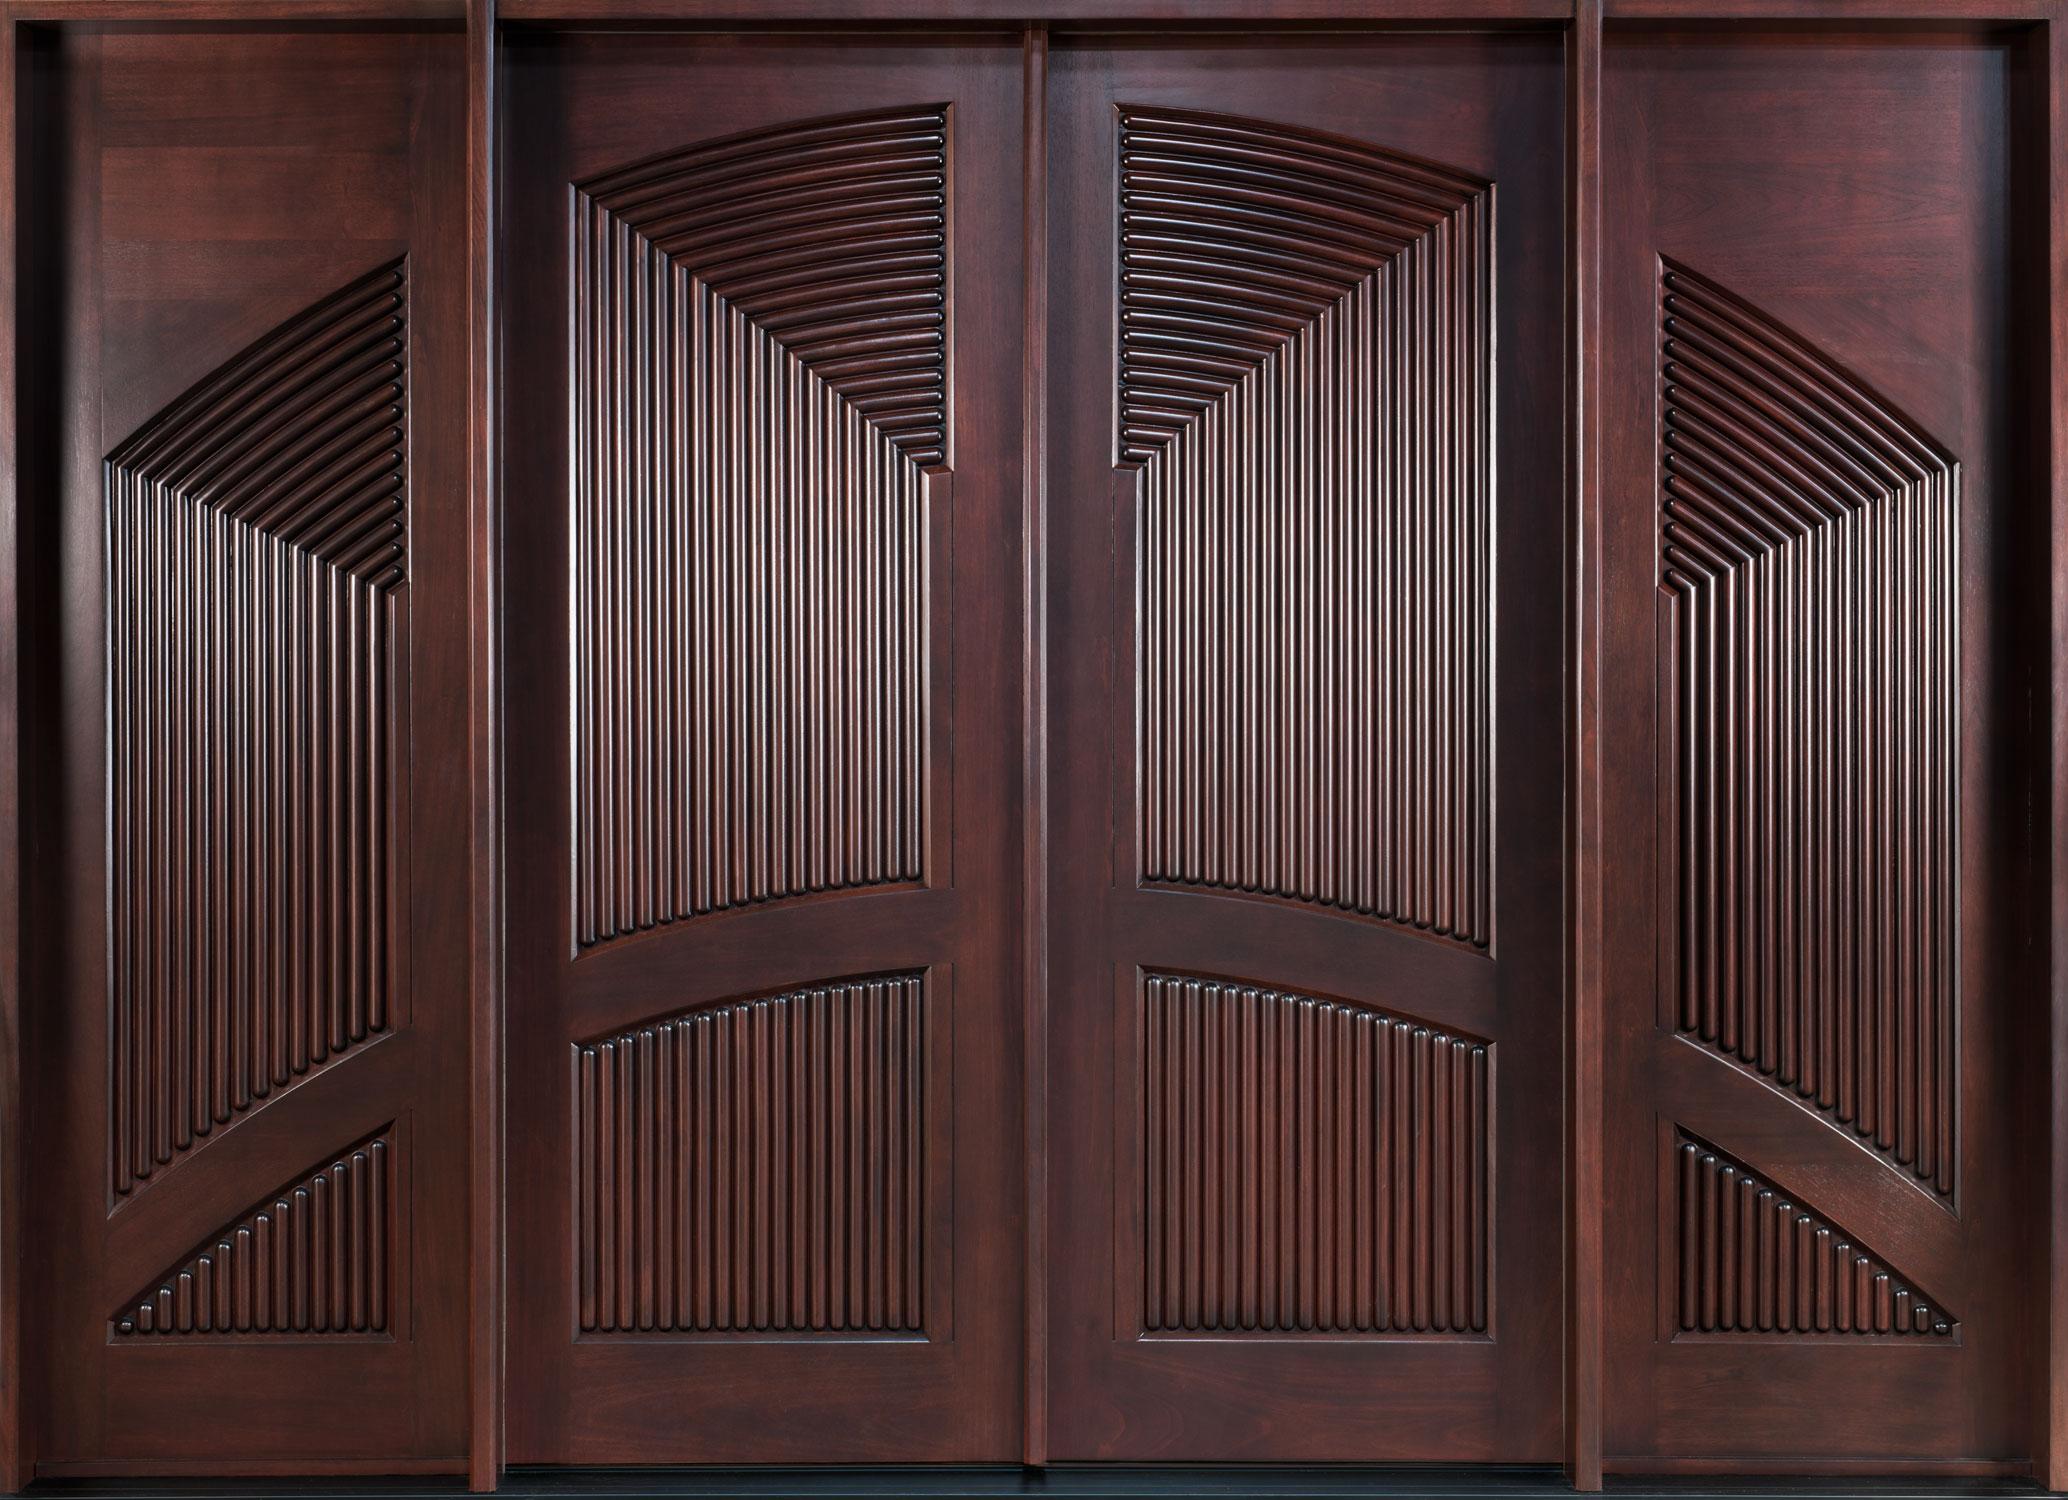 34+] Wallpaper for Door Entrance on WallpaperSafari